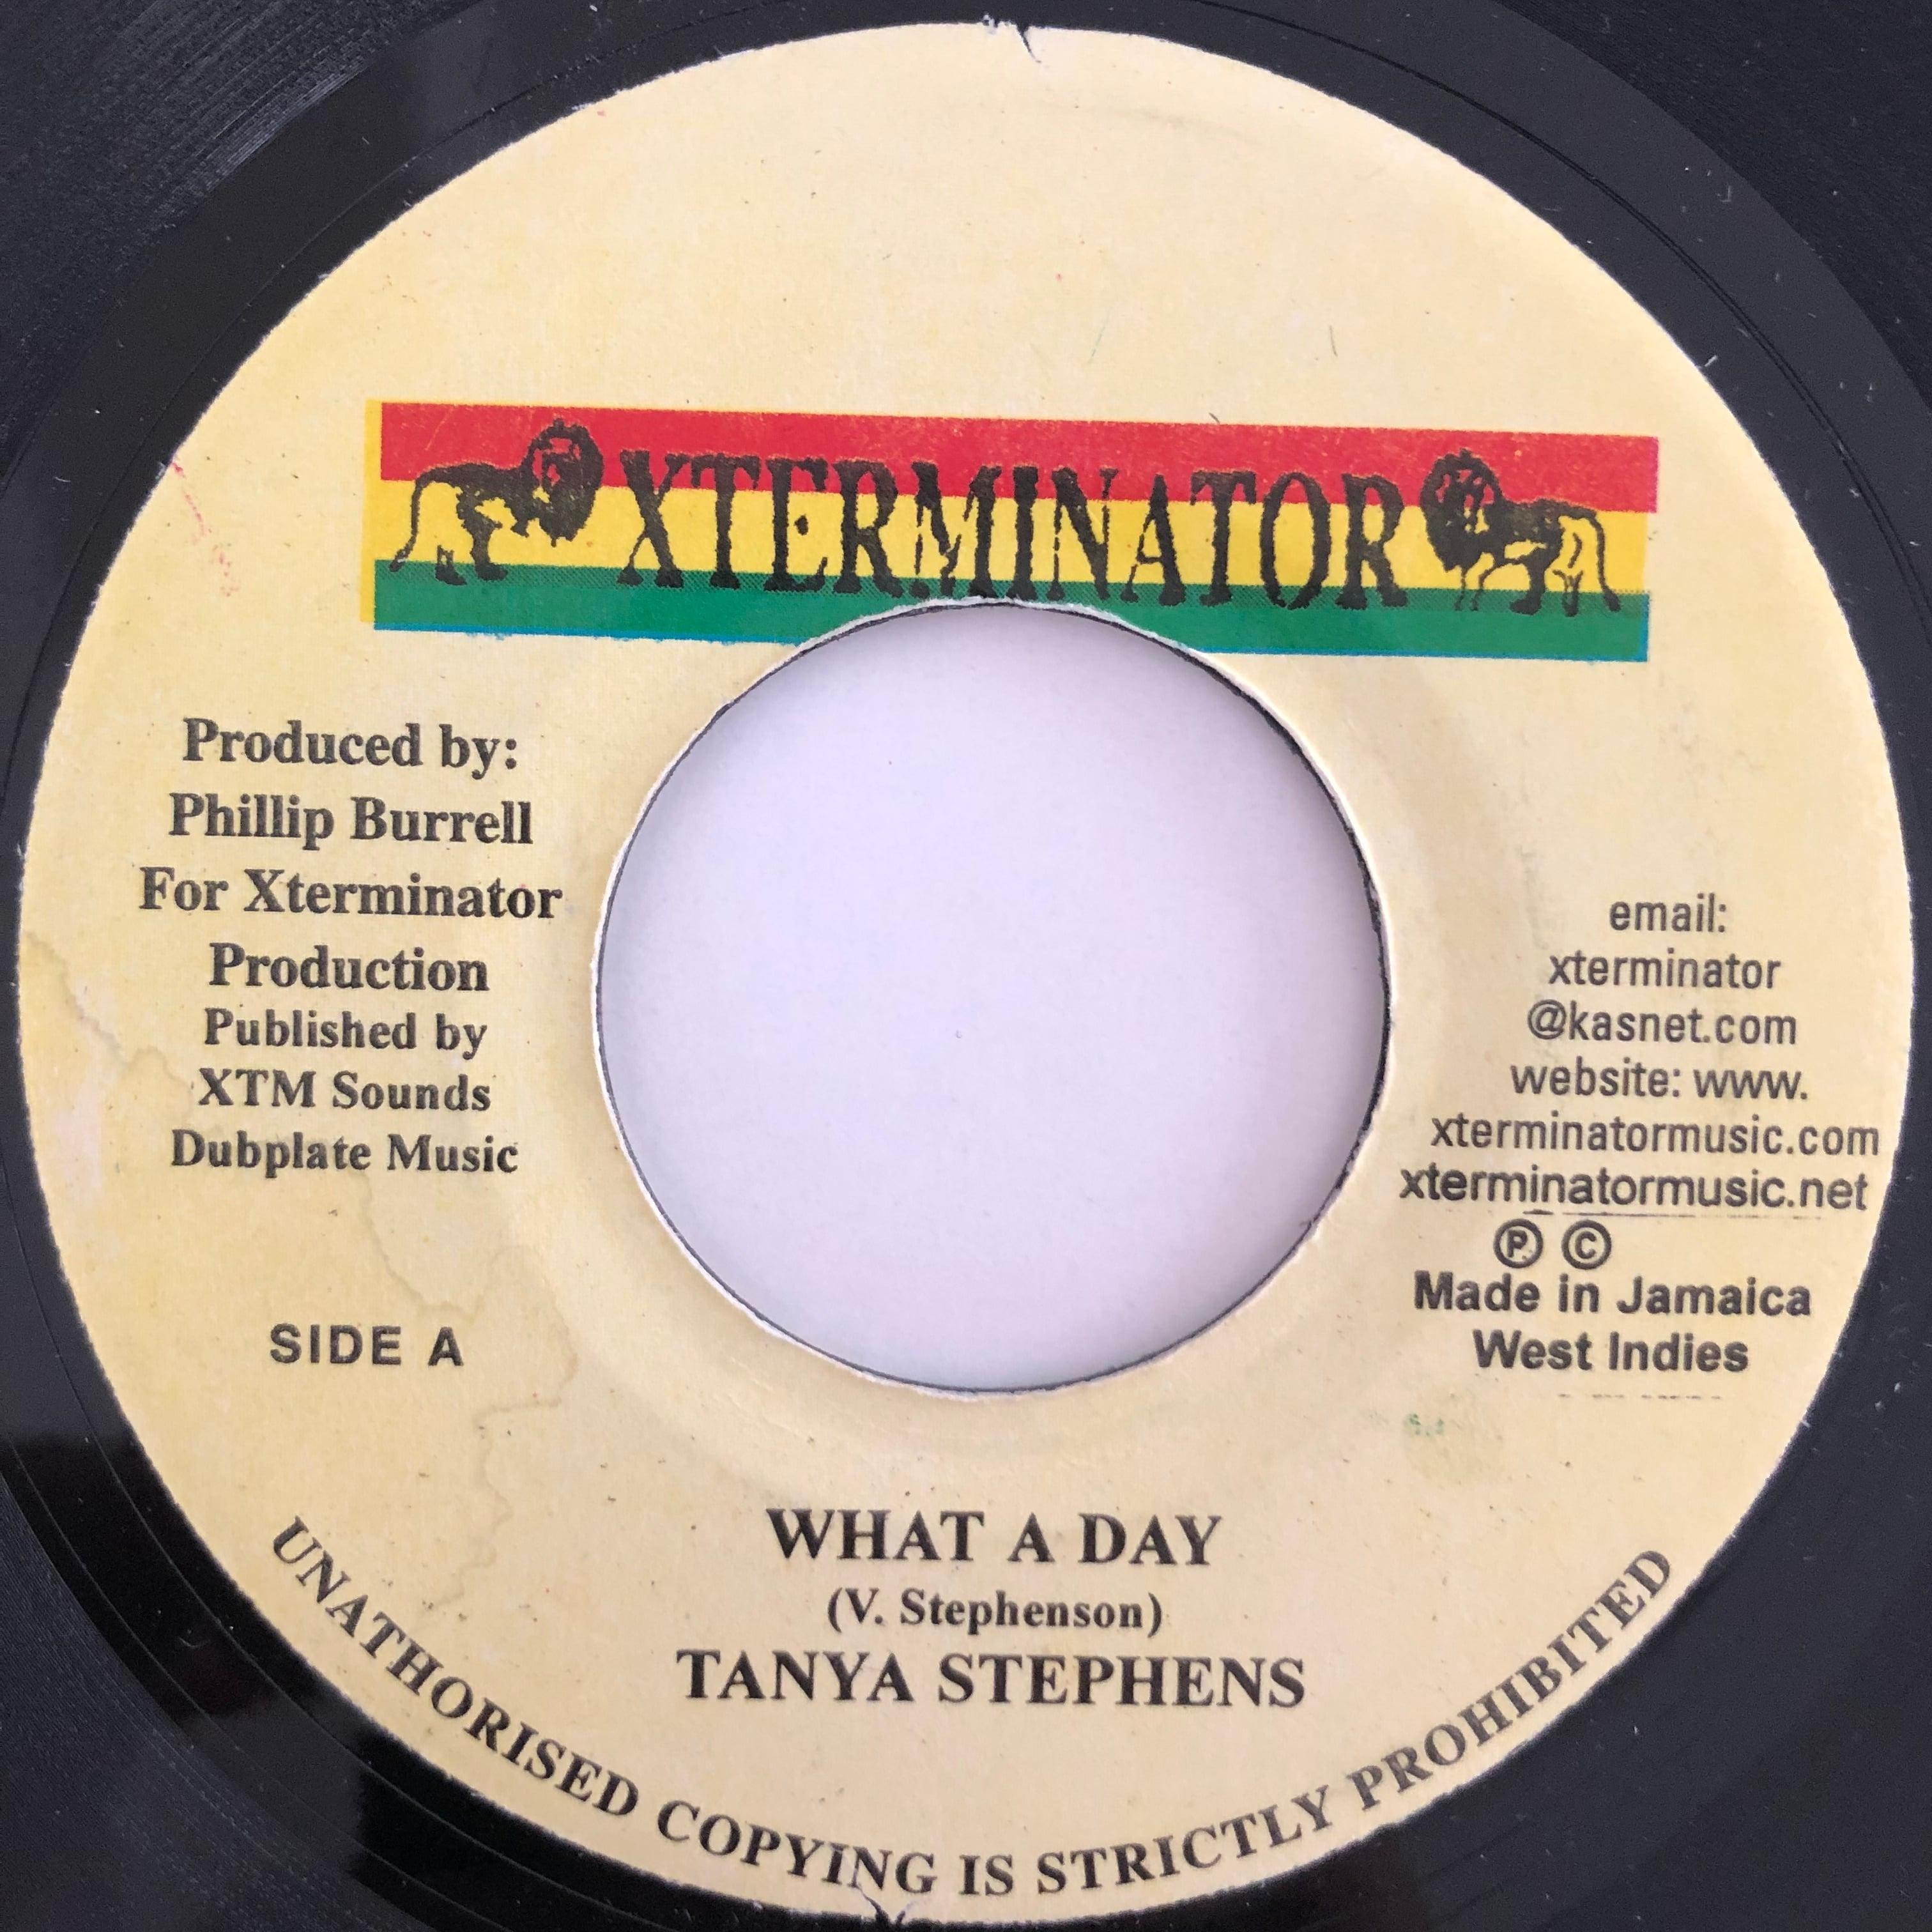 Tanya Stephens(タンヤスティーブンス) - What a day【7-20115】